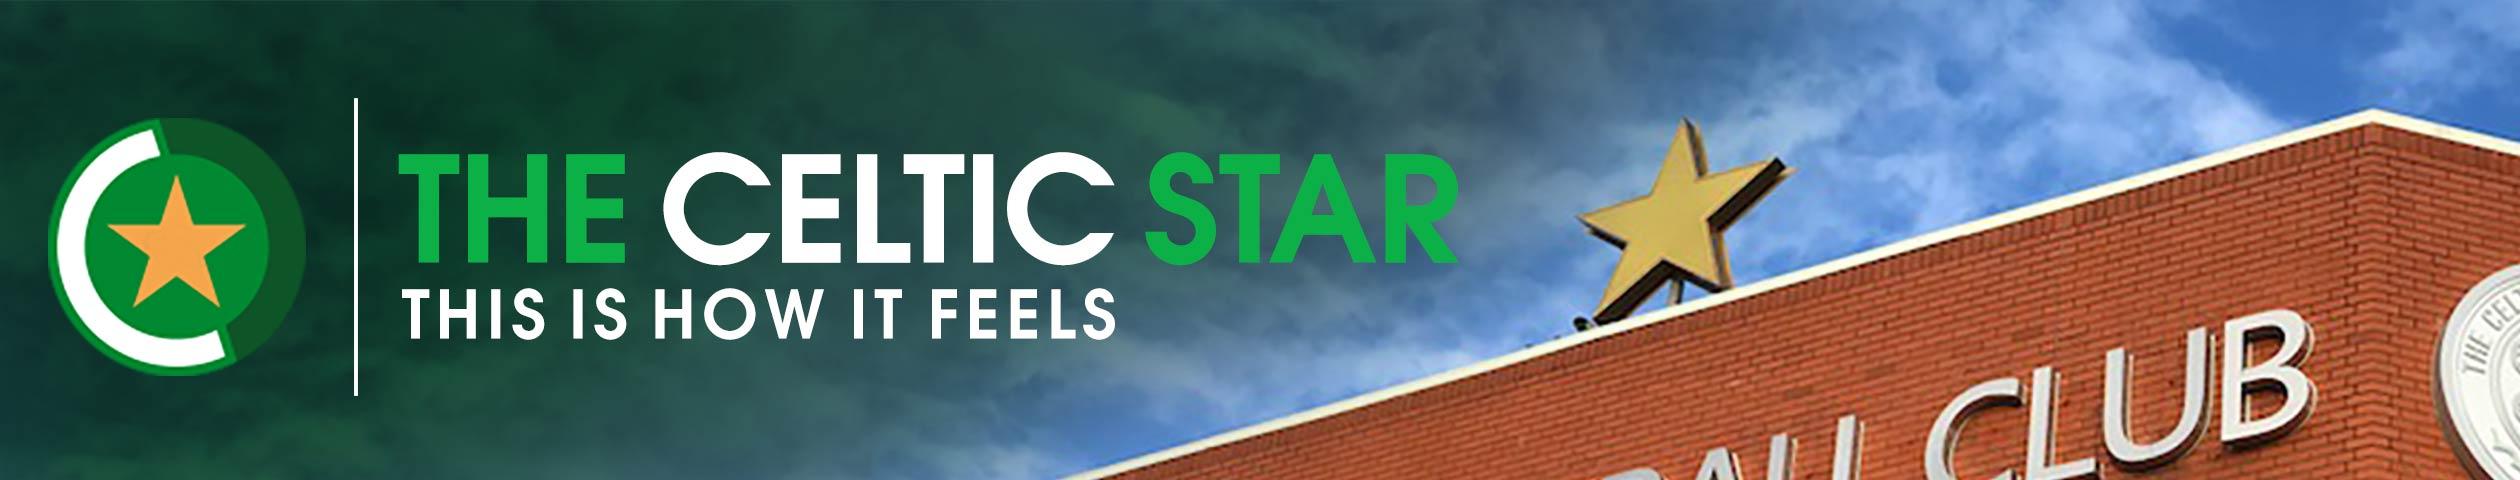 The Celtic Star